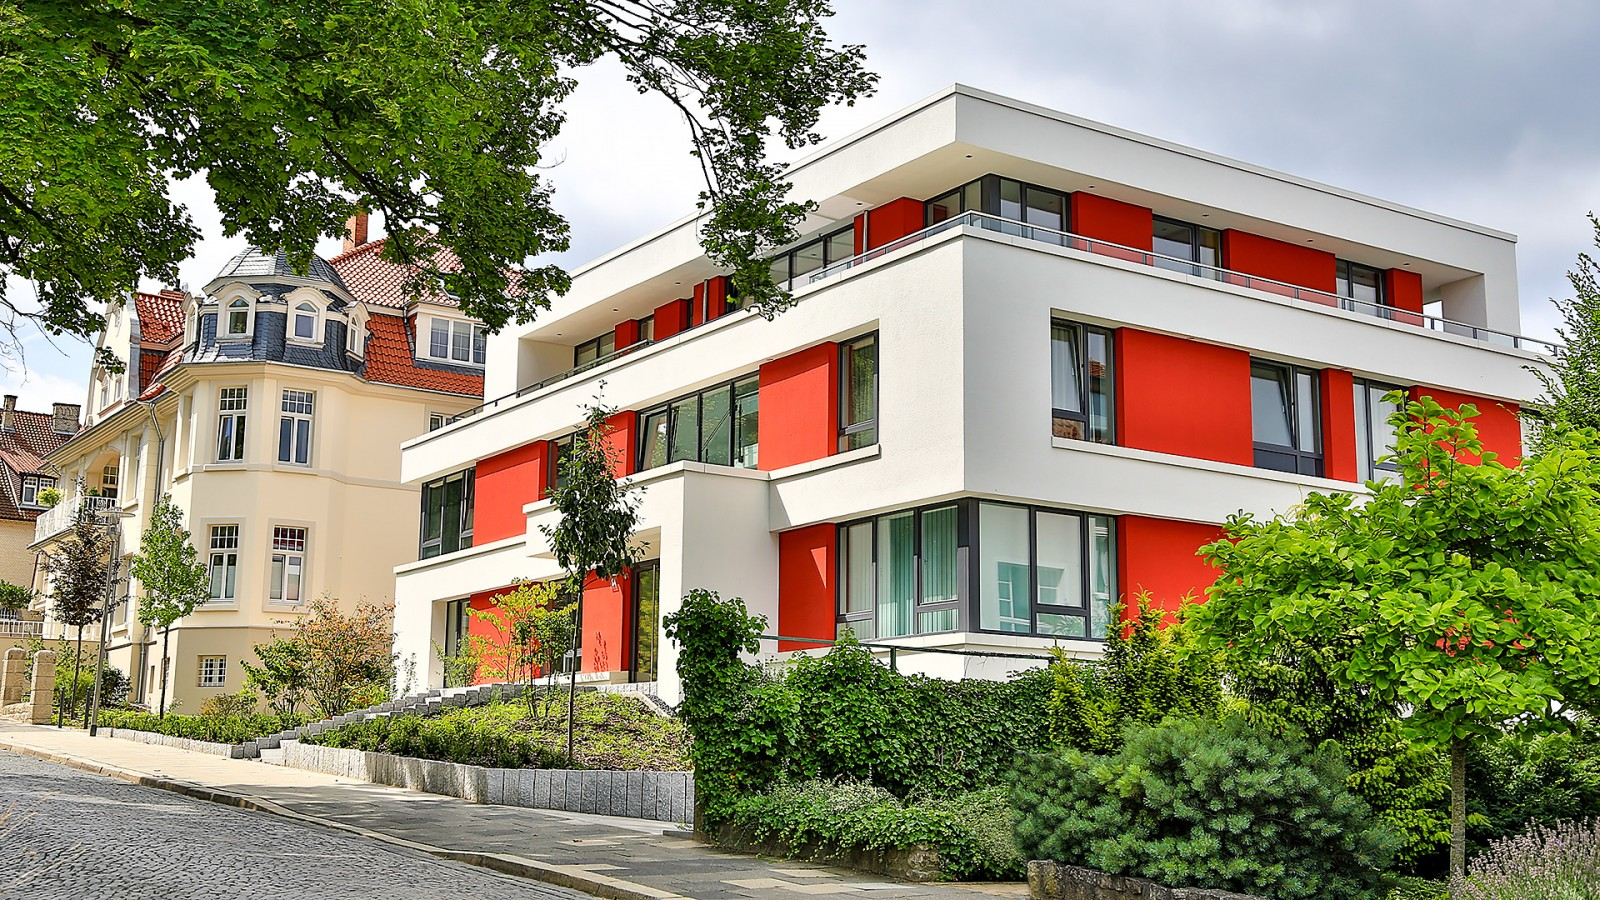 Neubau Mehrfamilienhaus in Hildesheim | JUNG - Architekturbüro, Innenarchitekturbüro Hildesheim